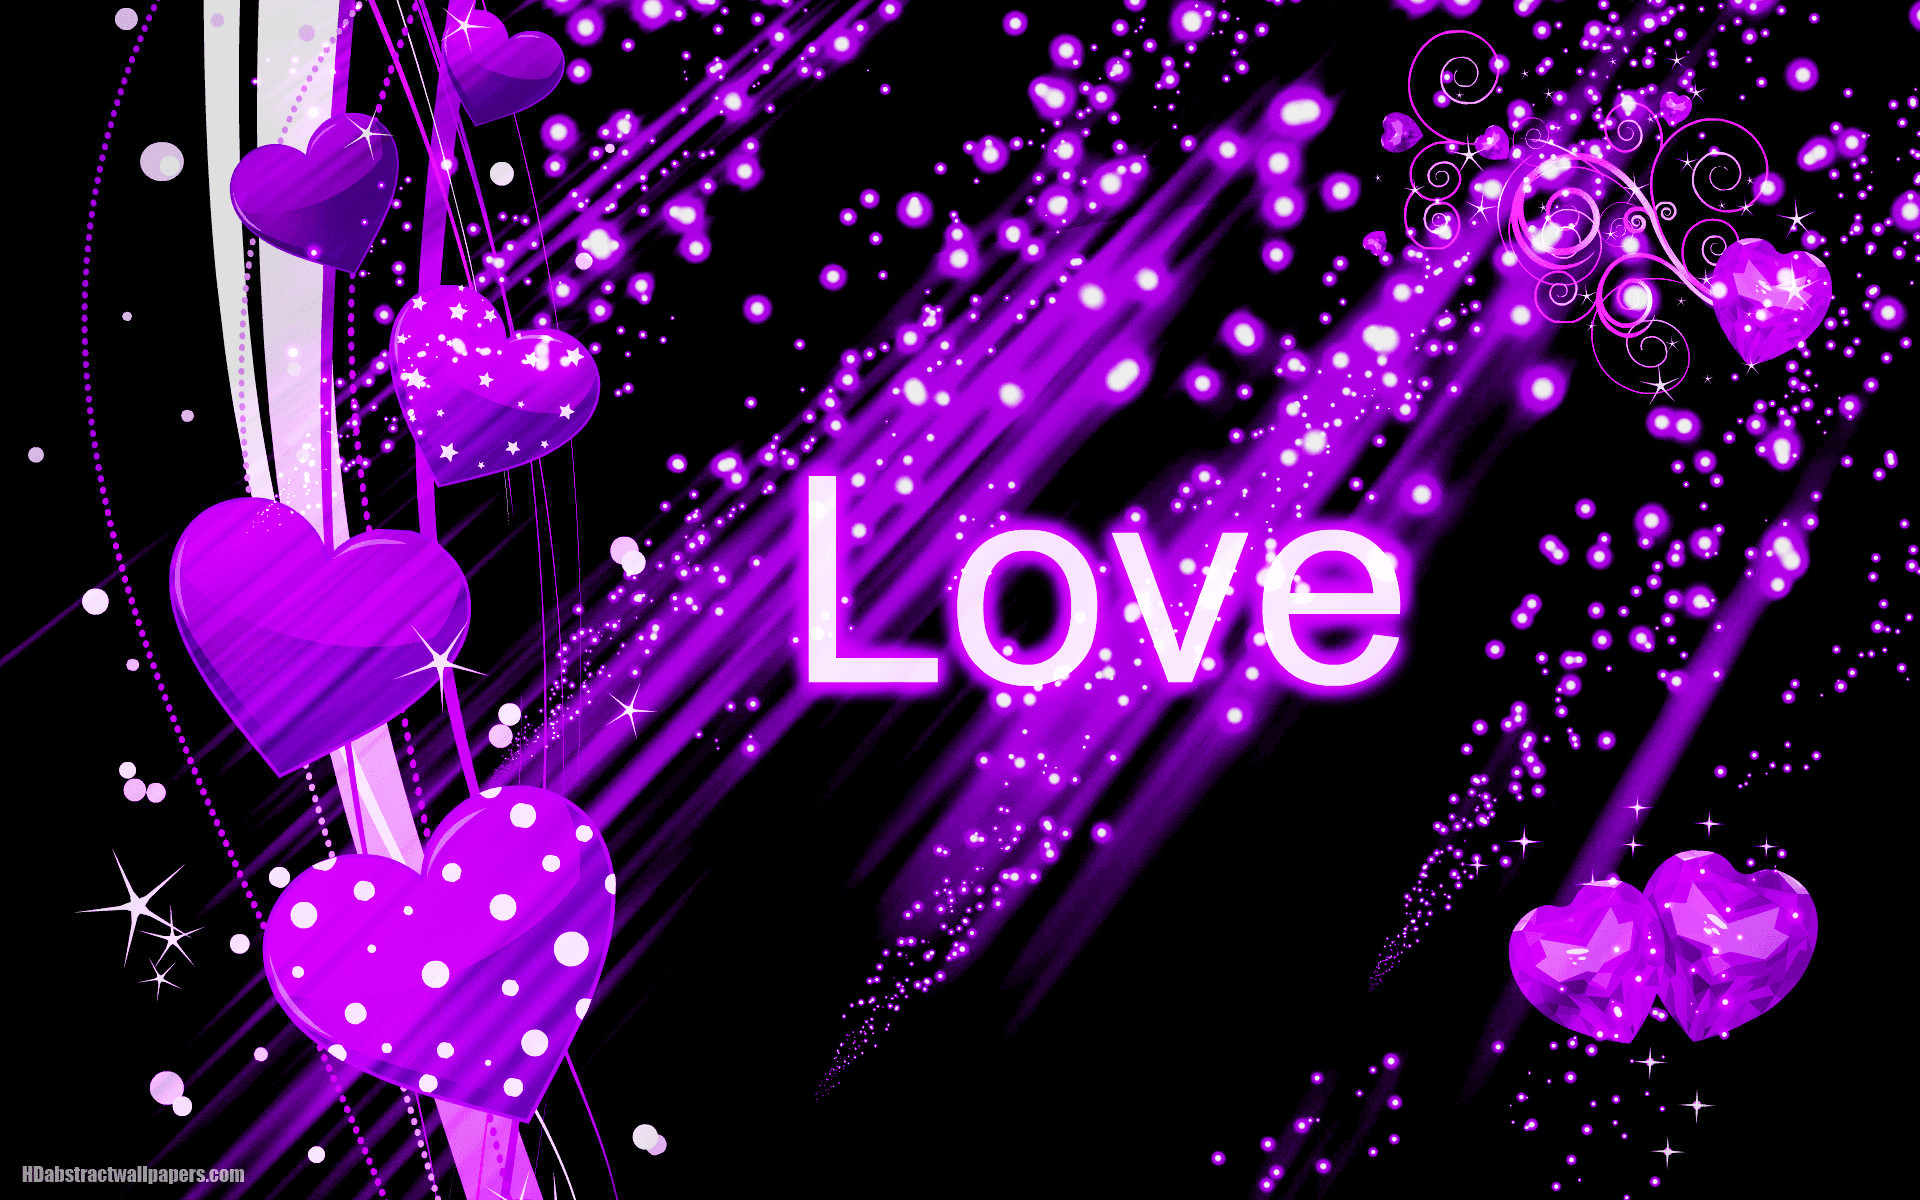 Purple Wallpapers 12 Best Wallpapers Collection Desktop: Purple Hearts Backgrounds (47+ Images